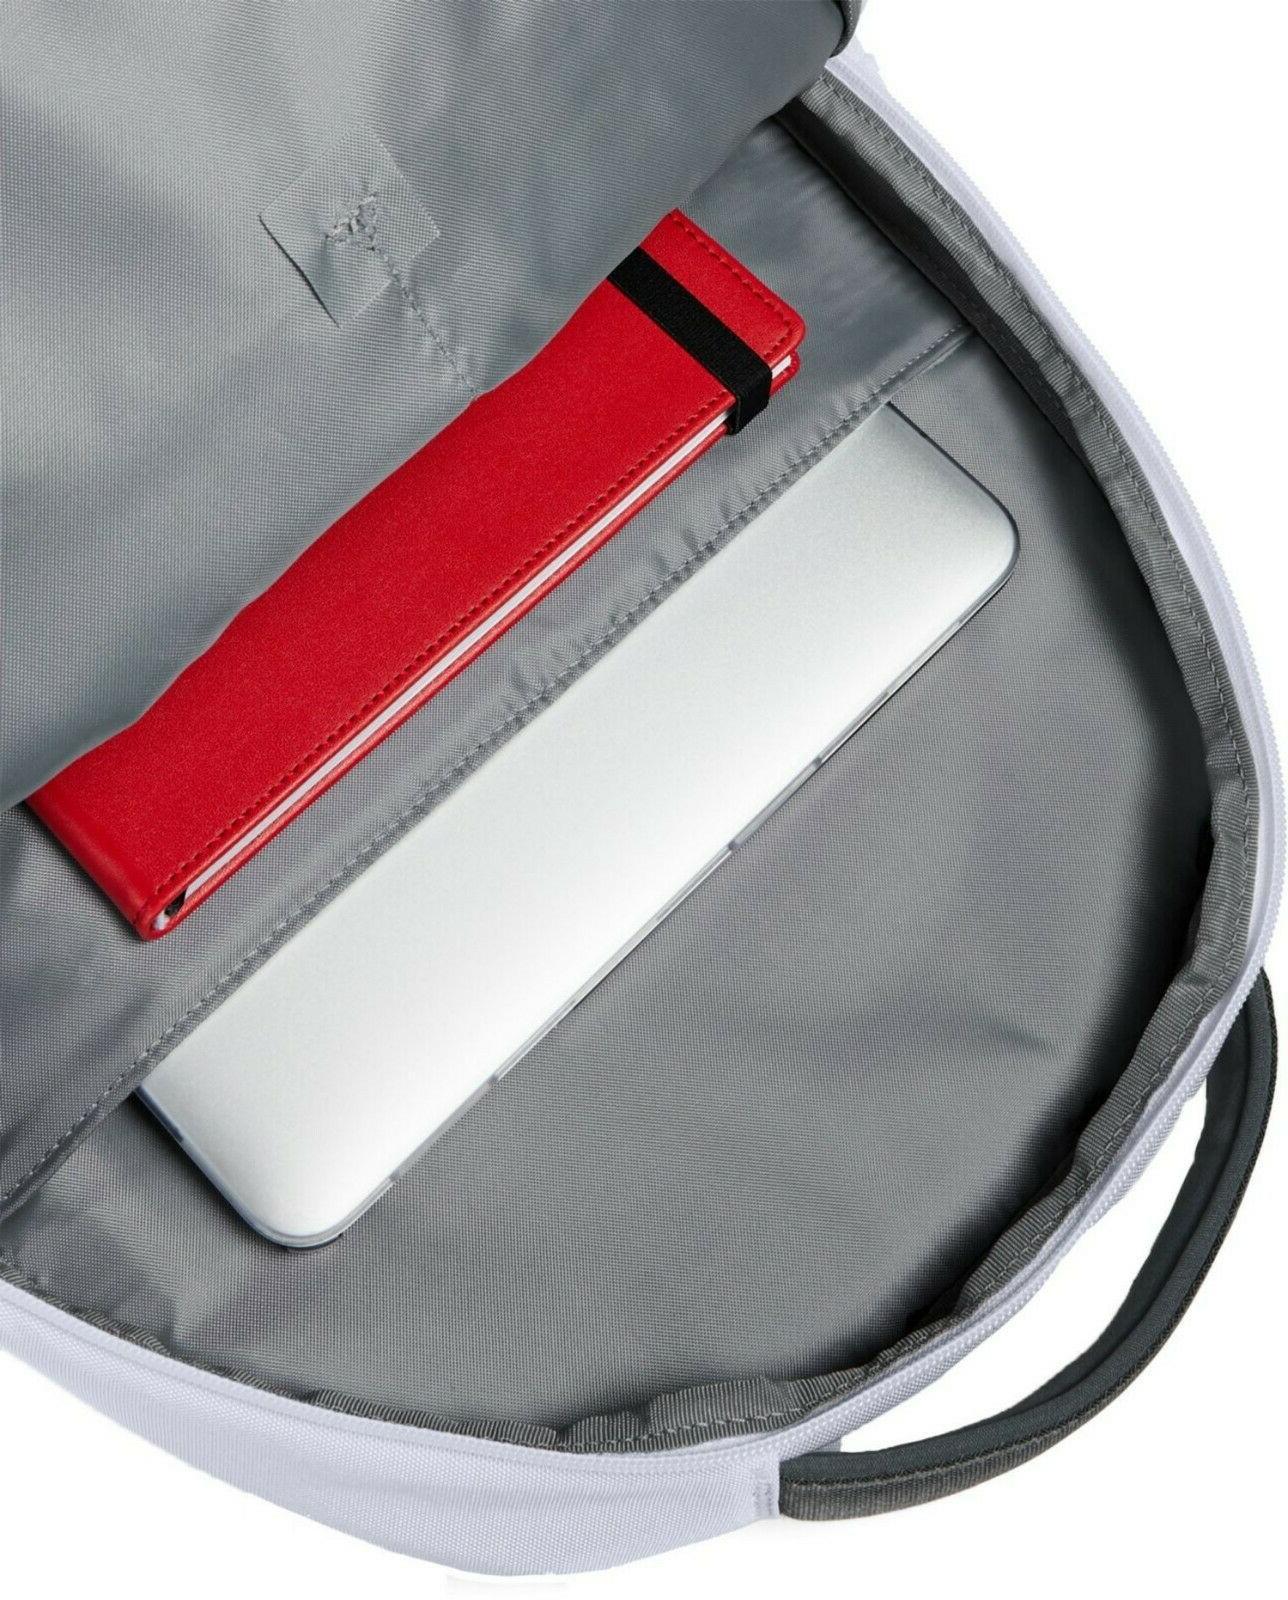 Under Armour 4.0 Laptop 1342651-100 New